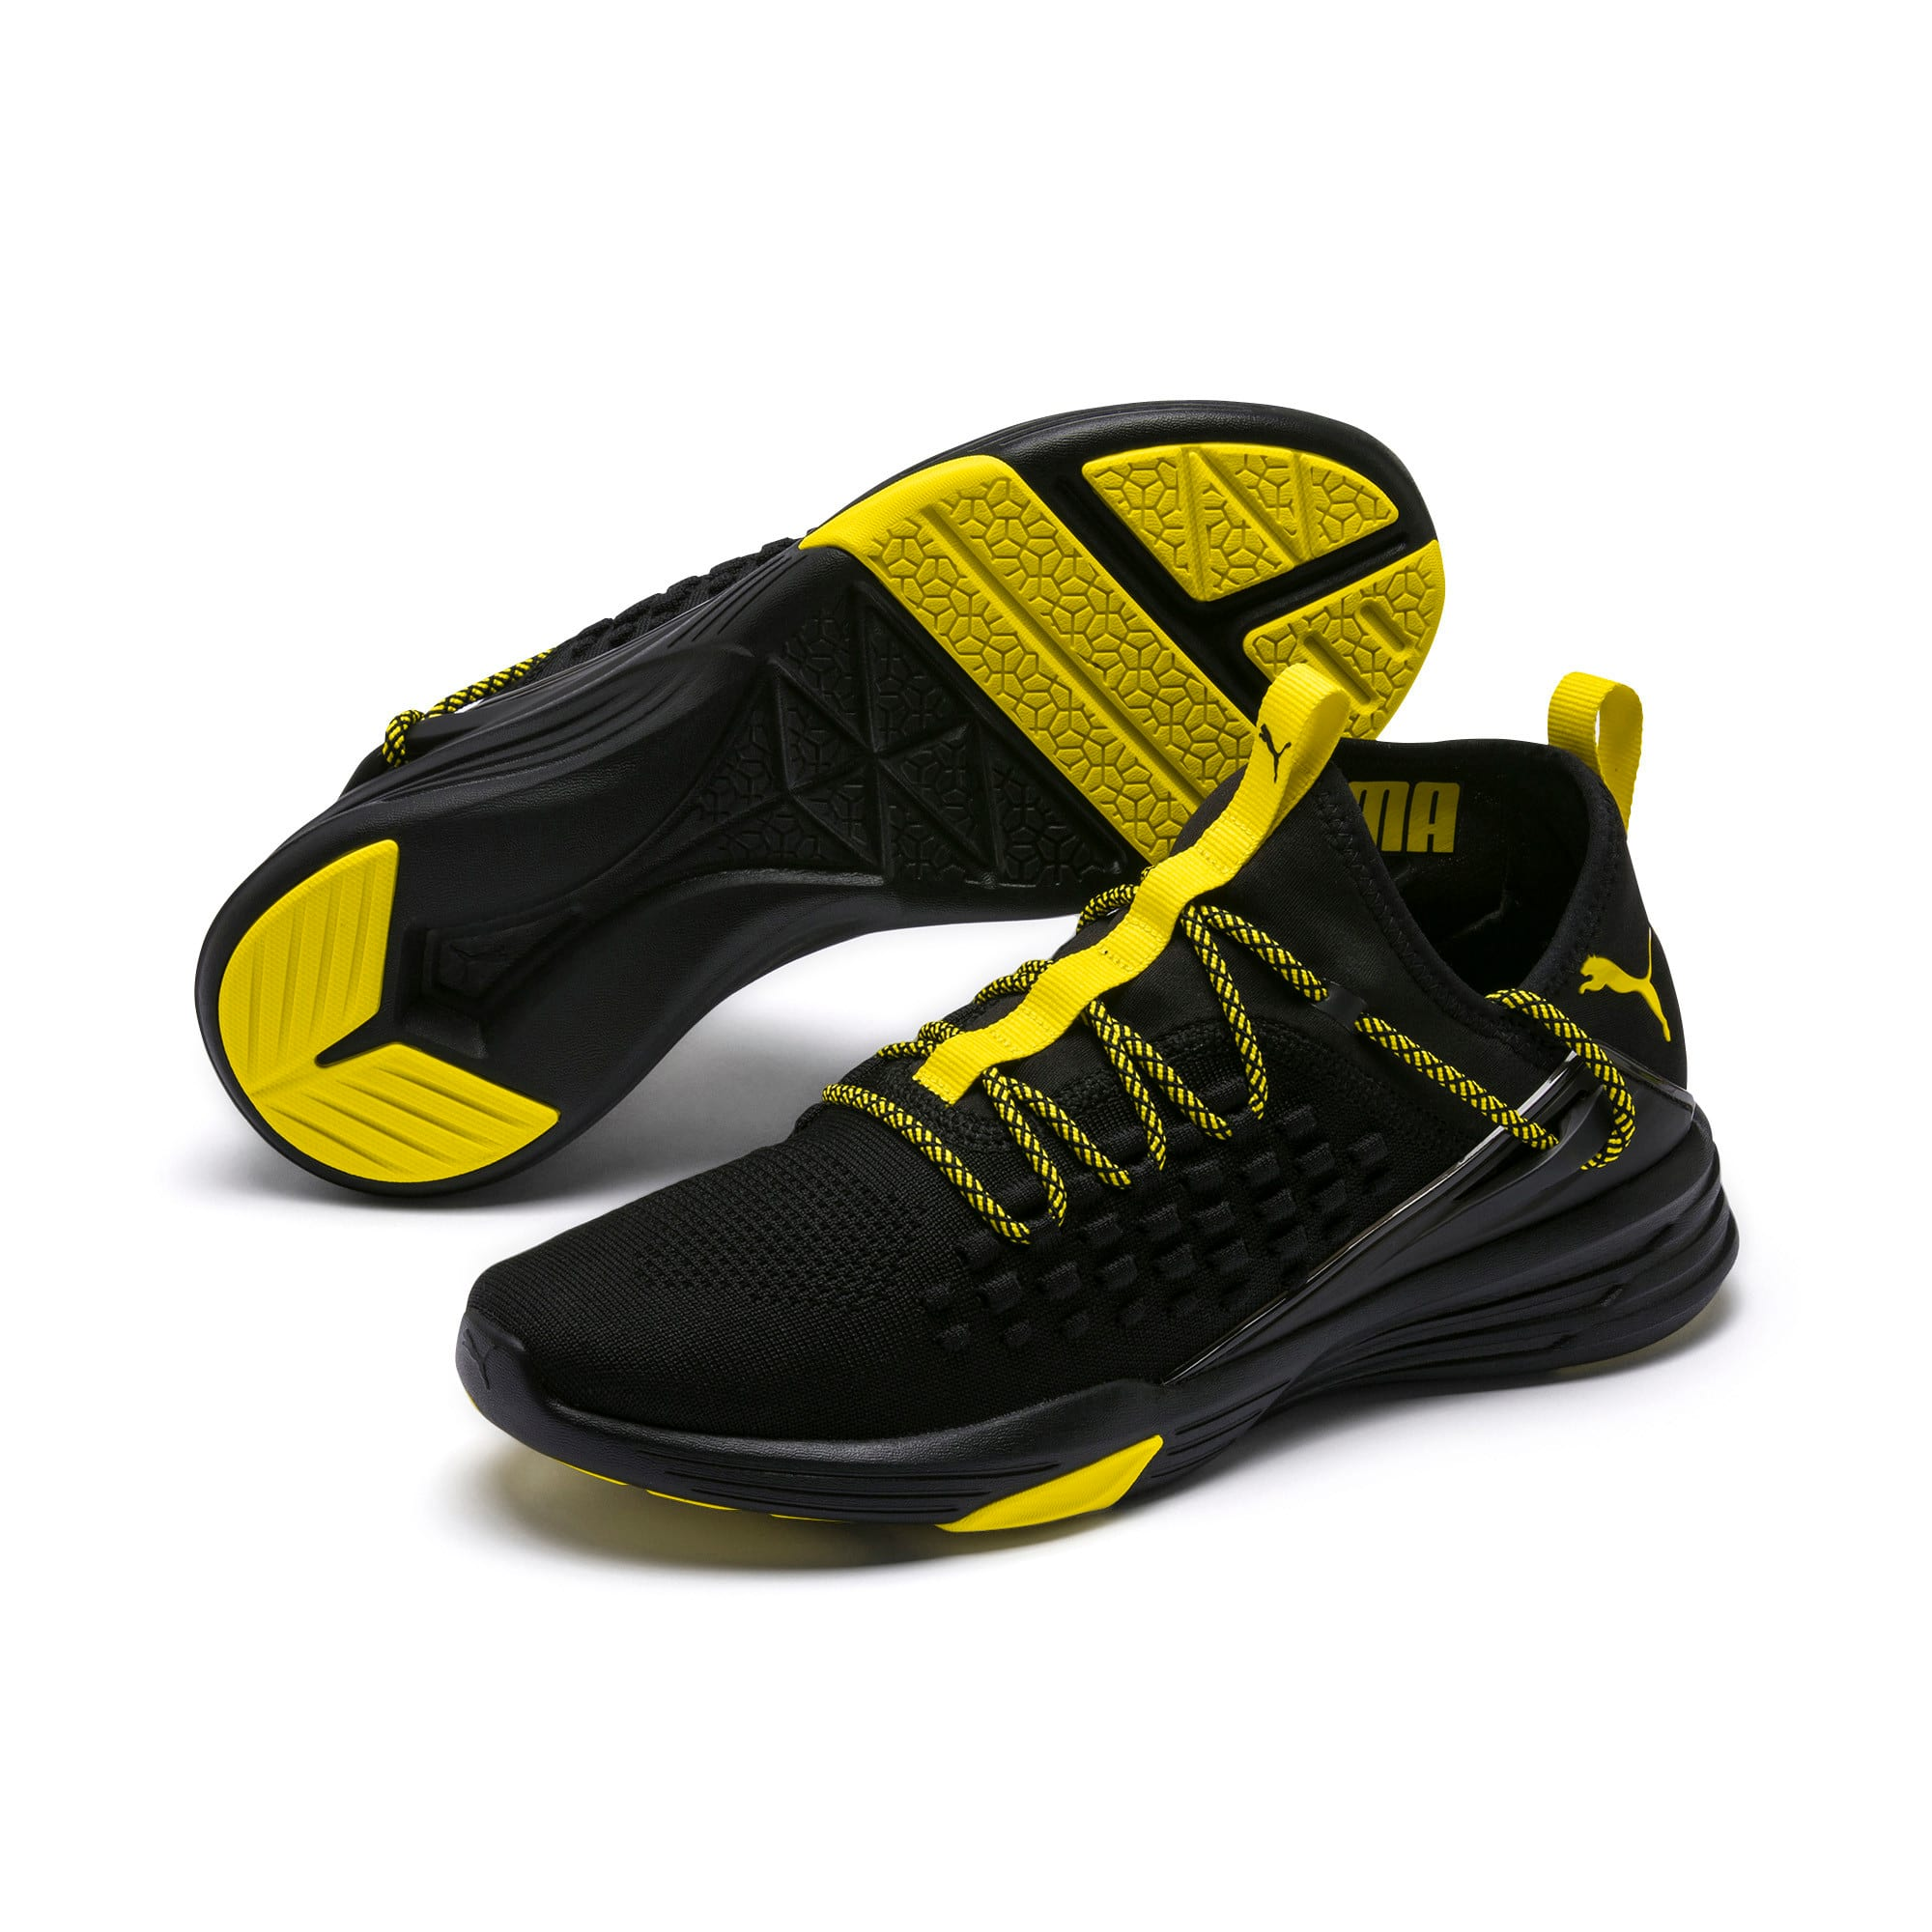 Thumbnail 2 of Mantra Caution Herren Trainingsschuhe, Puma Black-Blazing Yellow, medium